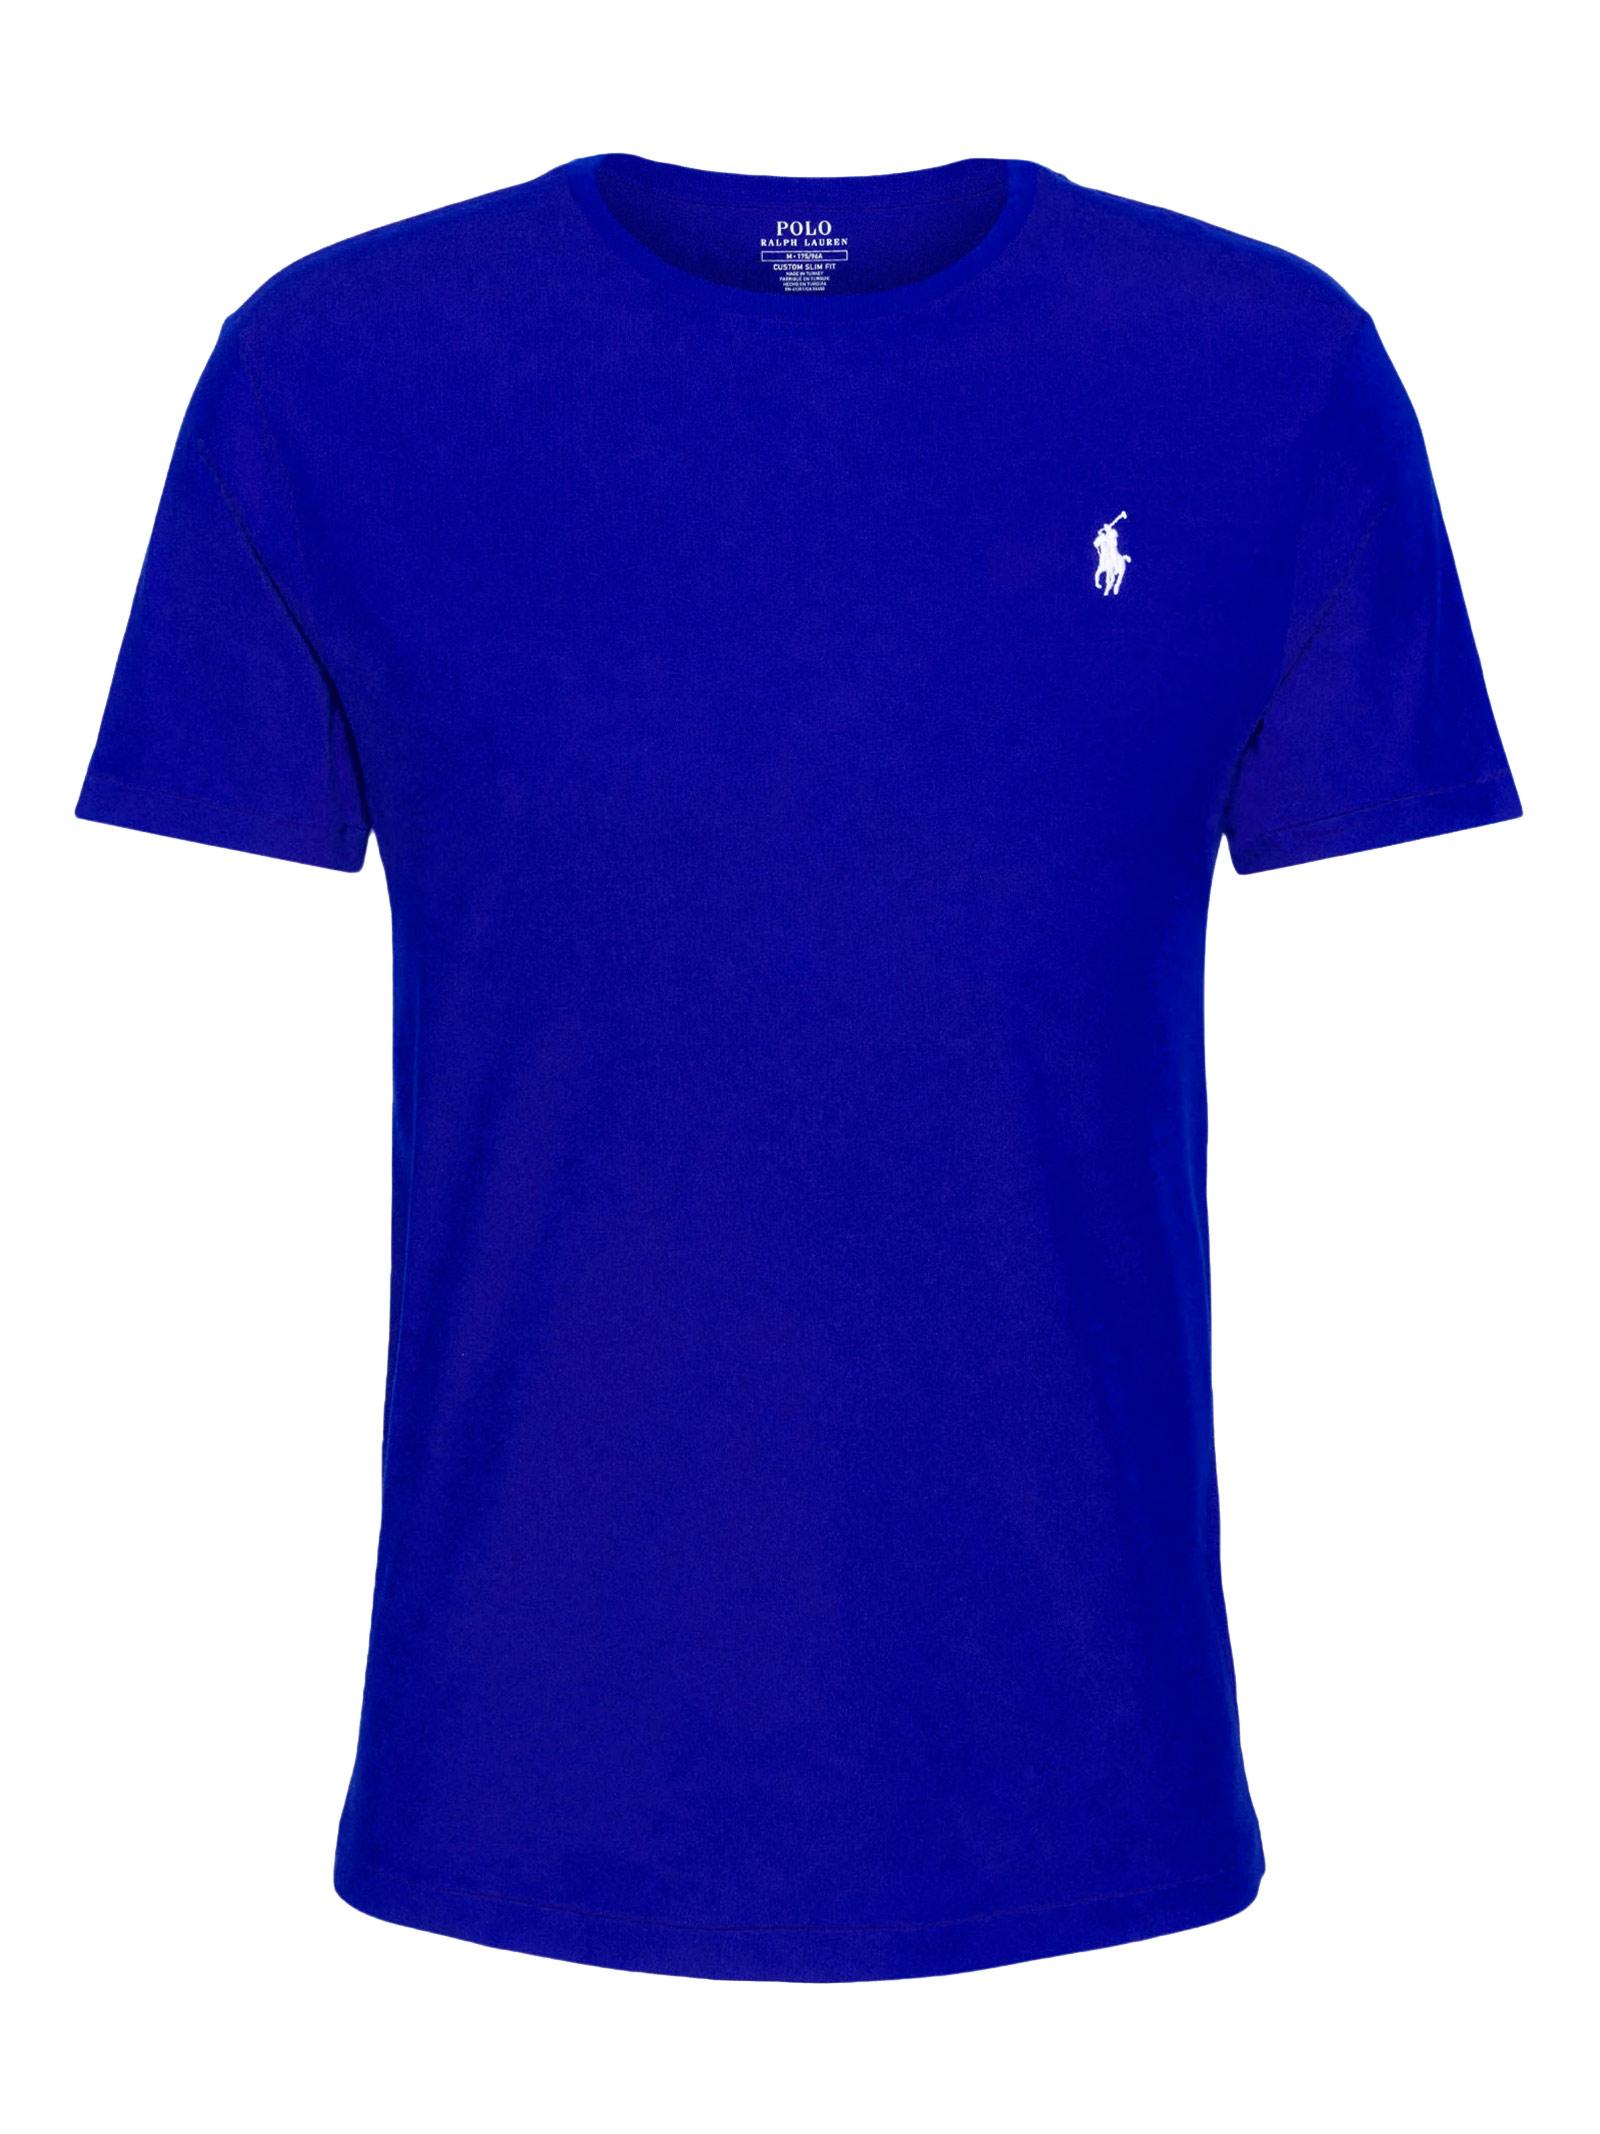 T-shirt blu girocollo slimfit RALPH LAUREN | T-shirt | 710-671438210